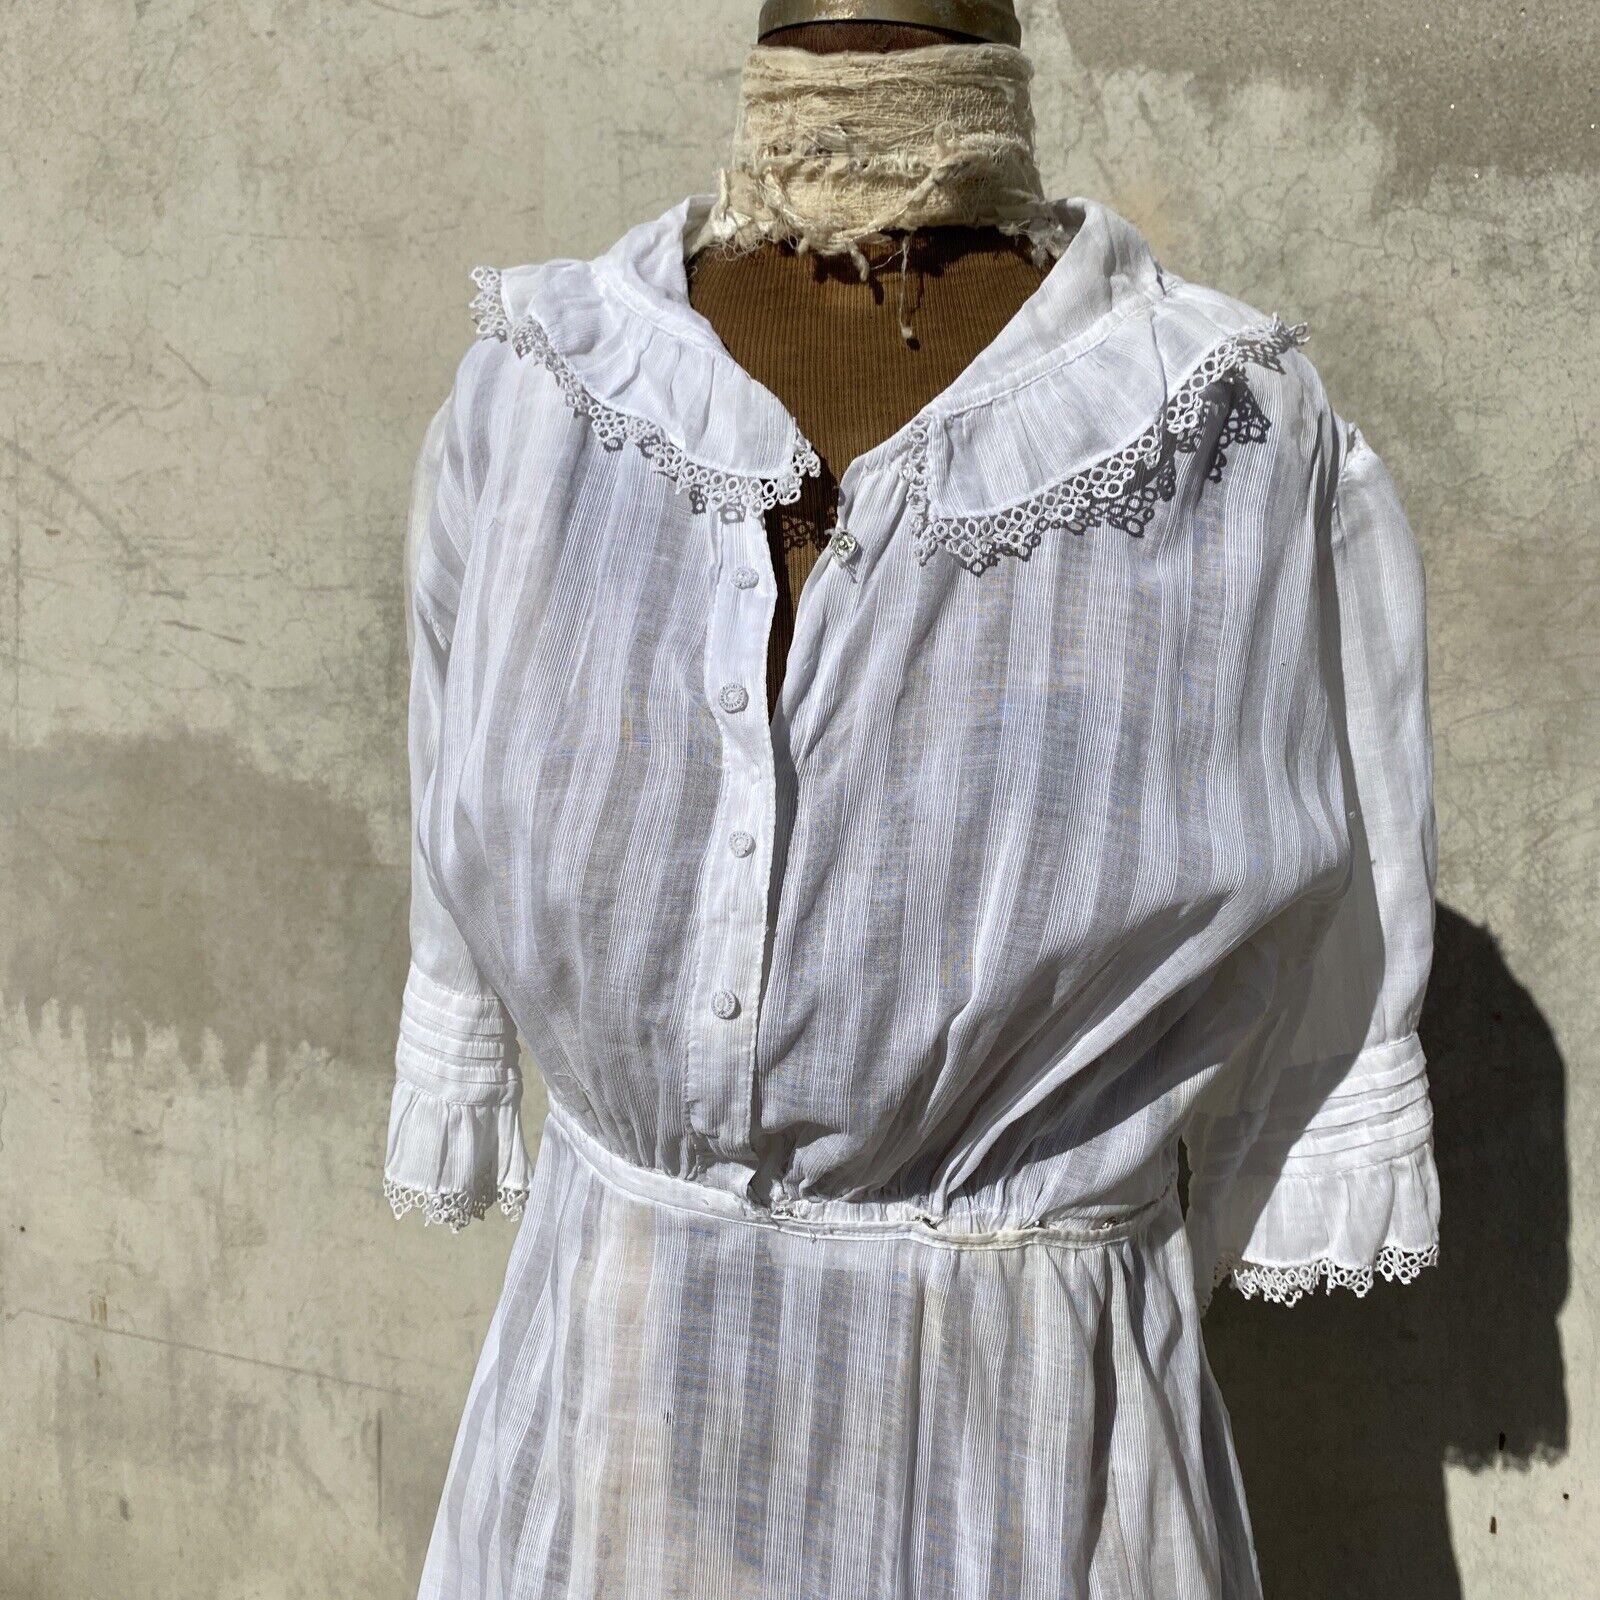 Antique Edwardian White Cotton Tea Dress Maxi Lac… - image 2